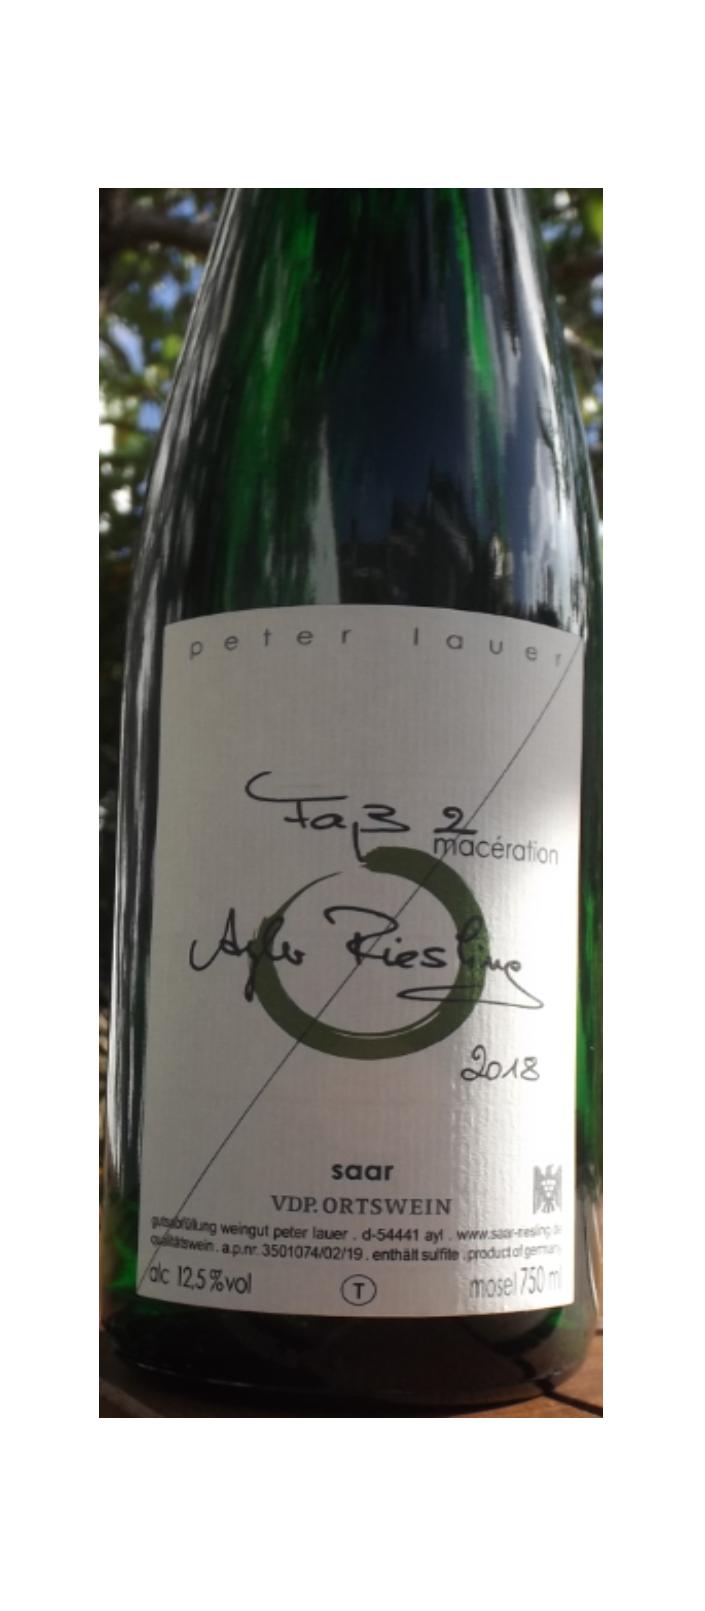 Weingut Peter Lauer/ Sarre - Ayler Riesling Fass 2 2018 sec